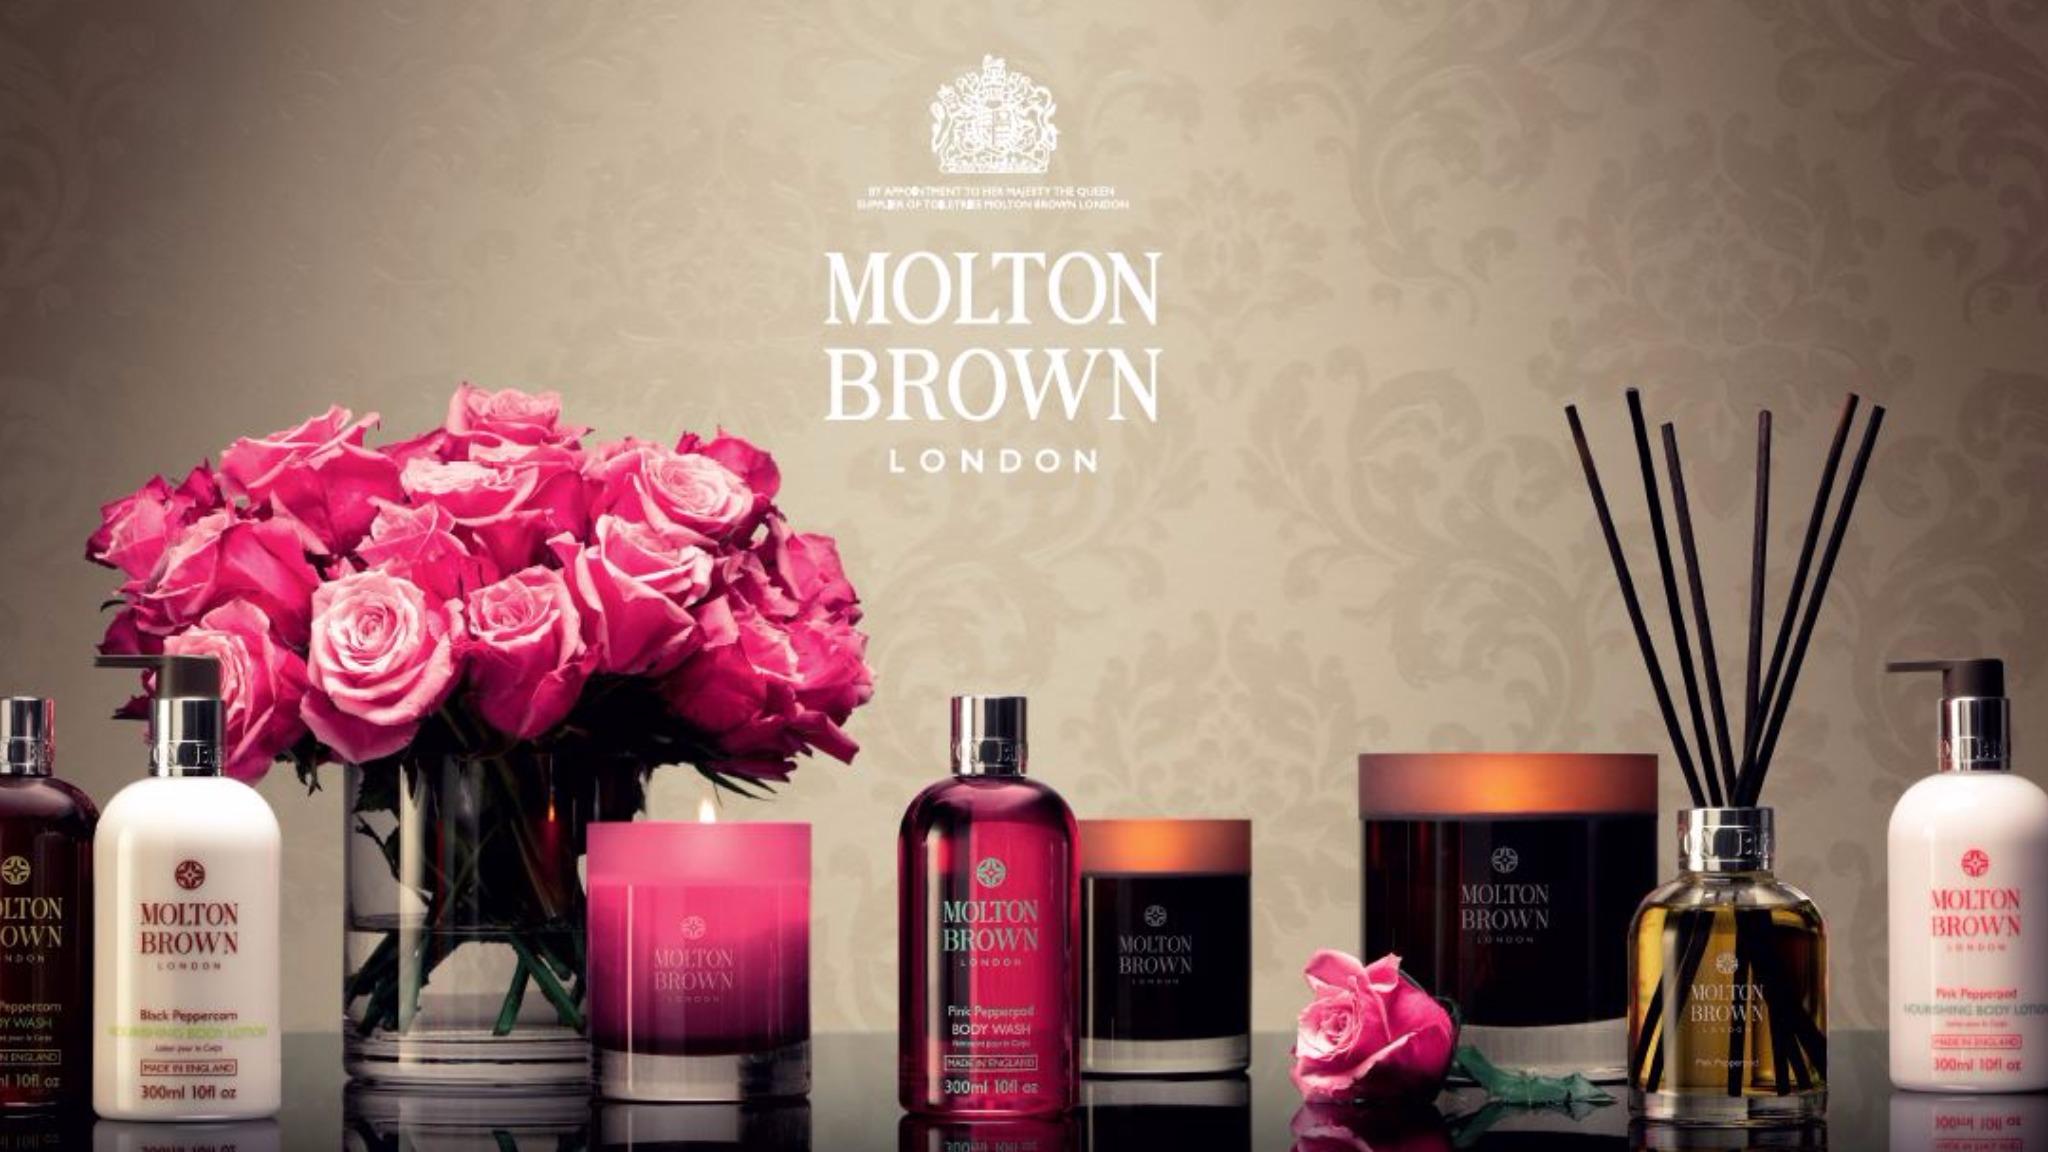 【Molton Brown】奢侈护理品牌摩顿布朗全线25% OFF